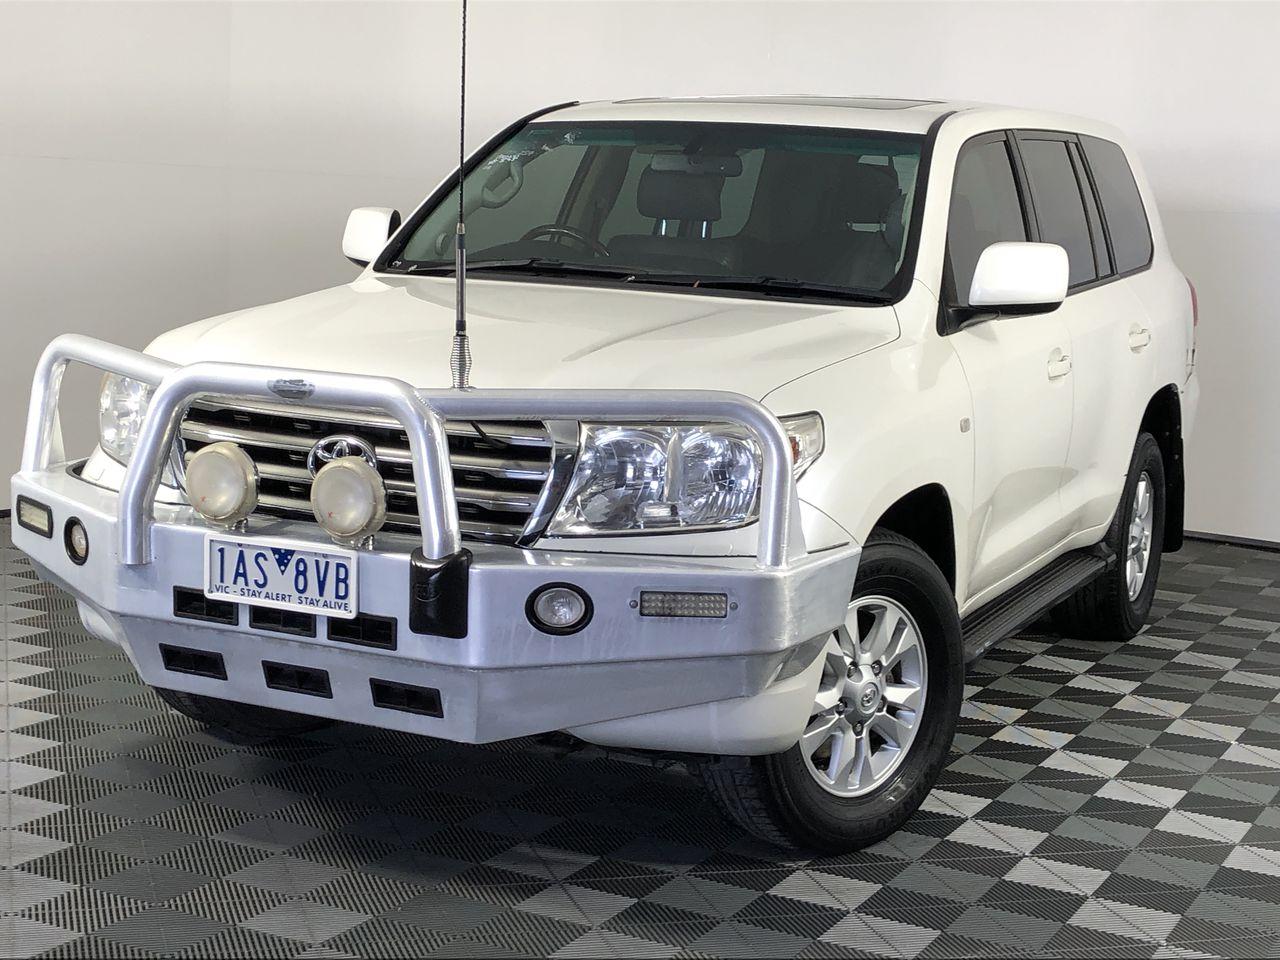 2007 Toyota Landcruiser Sahara (4x4) VDJ200R T/Diesel Auto 8 Seats Wagon